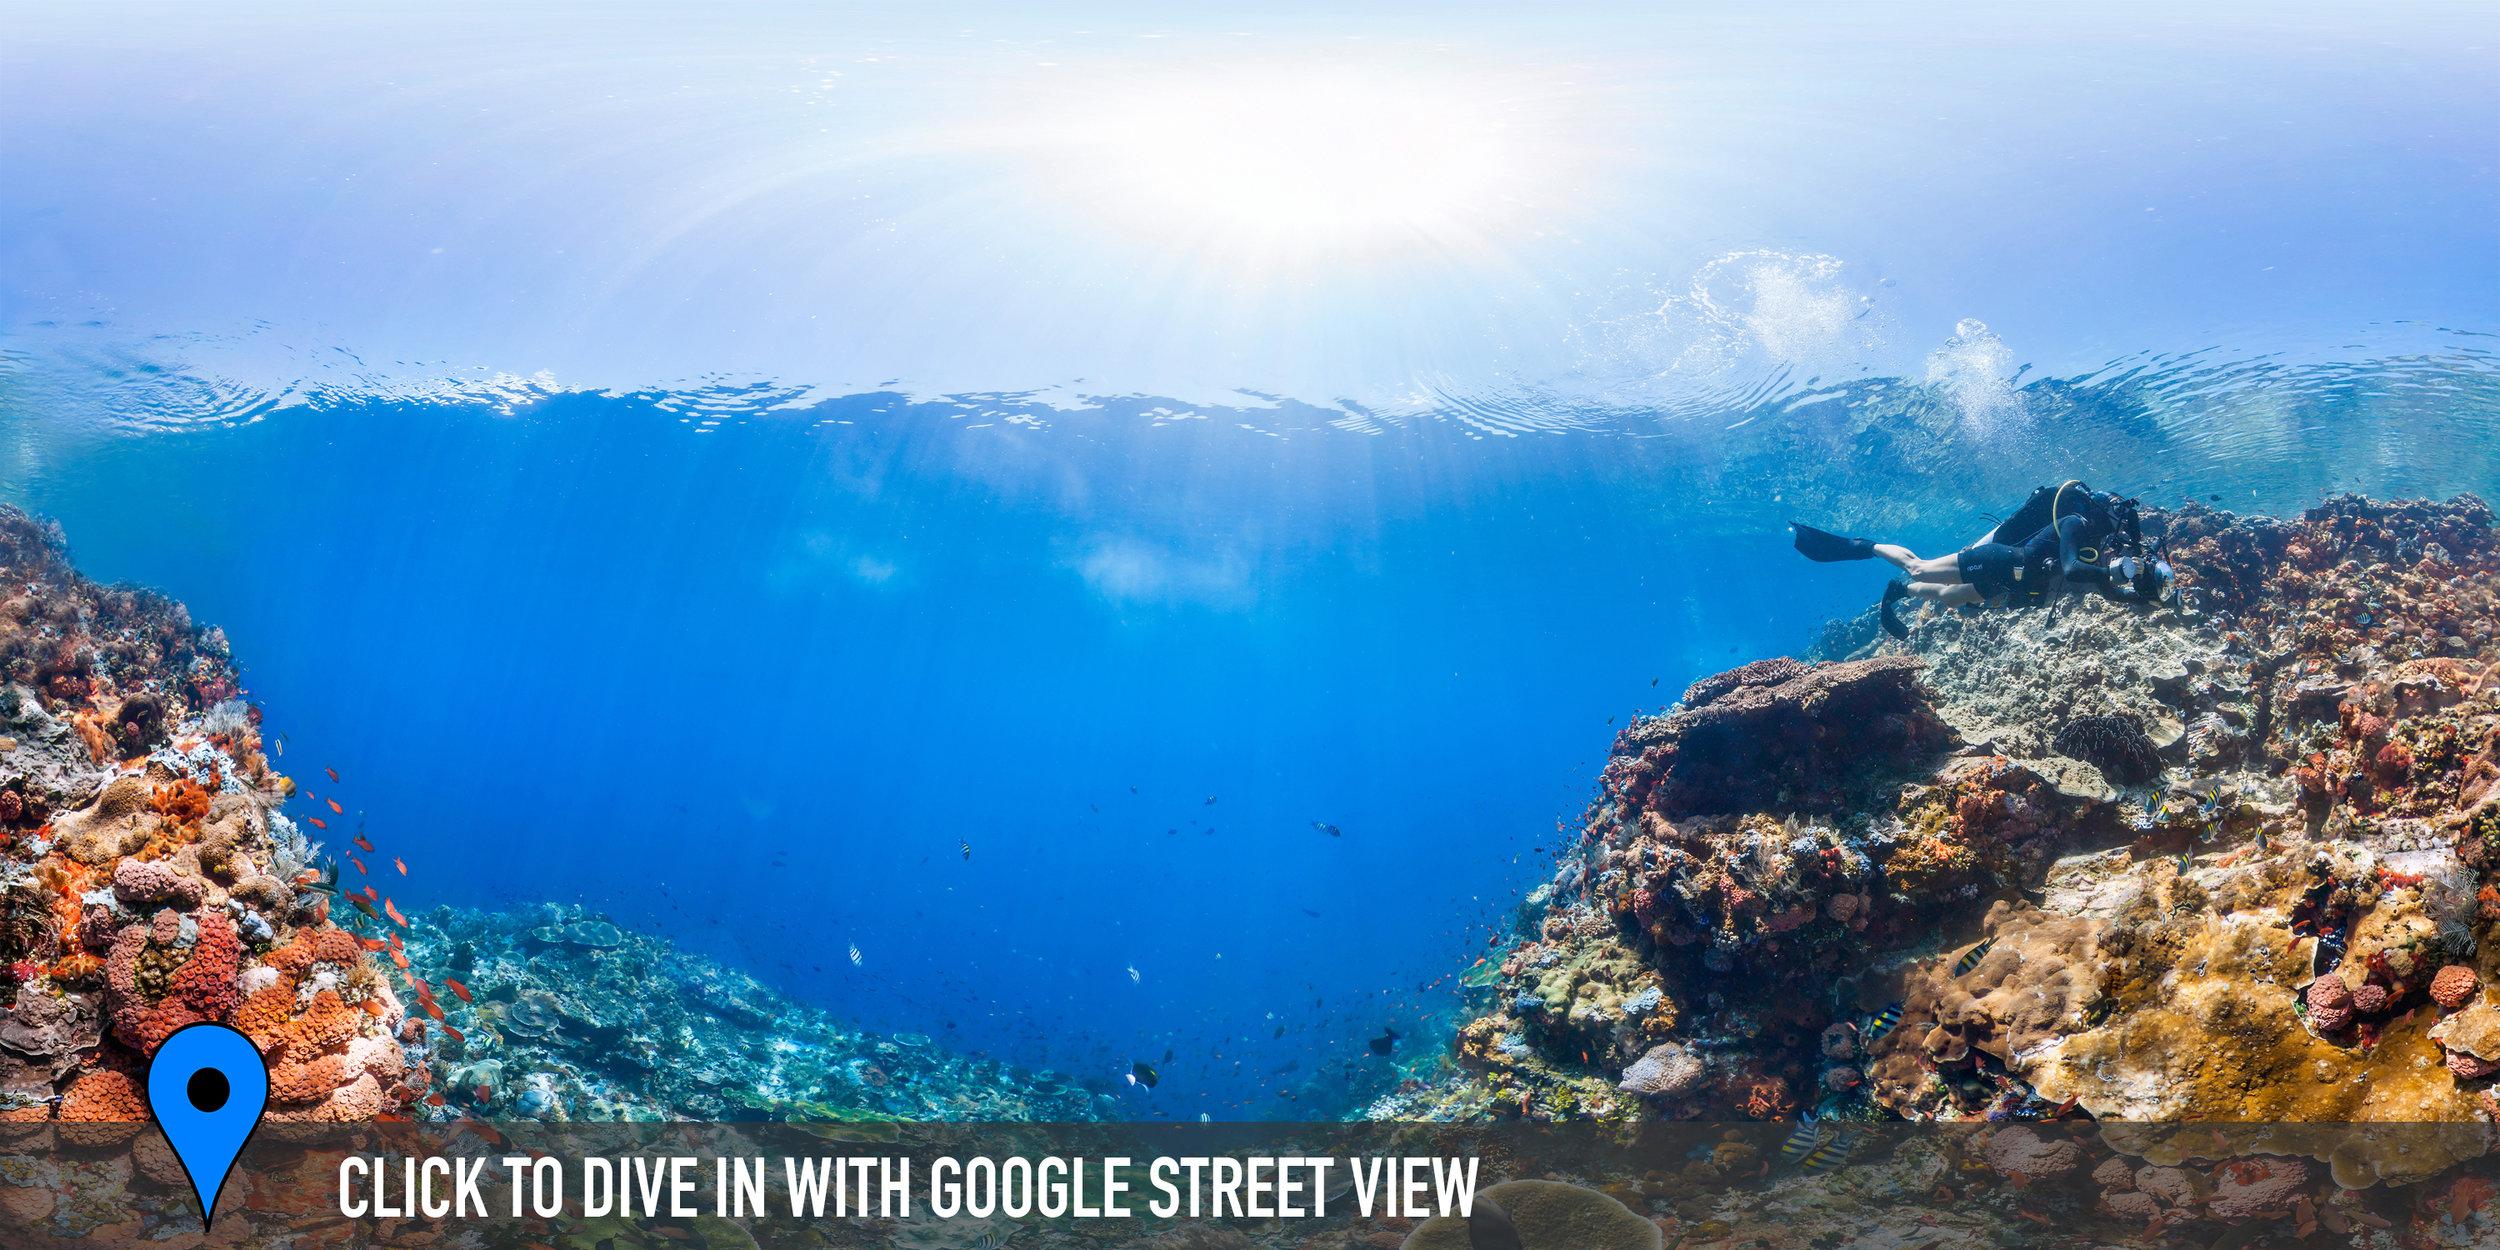 BATU BOLONG, KOMODO, INDONESIA CREDIT: THE OCEAN AGENCY / XL CATLIN SEAVIEW SURVEY